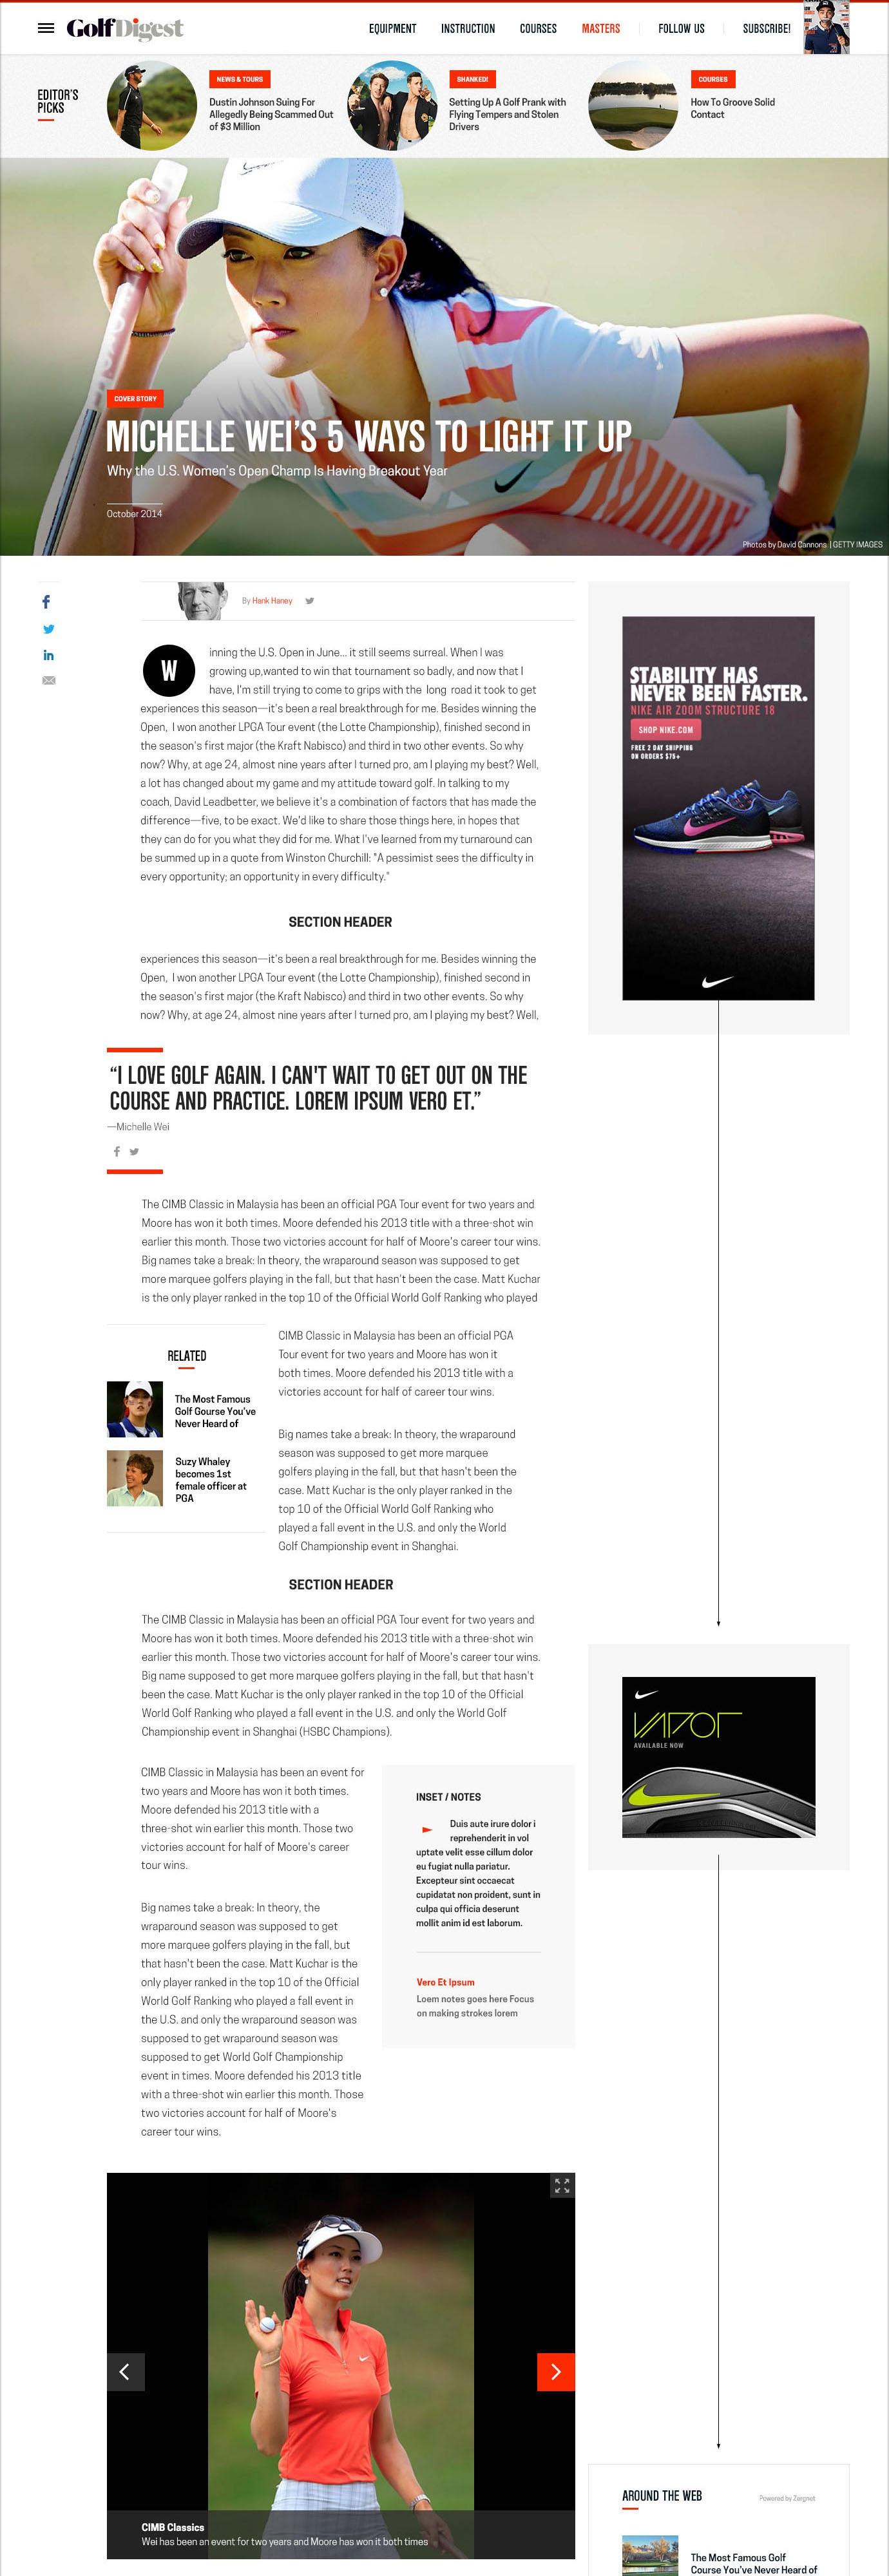 GD_Article.jpg